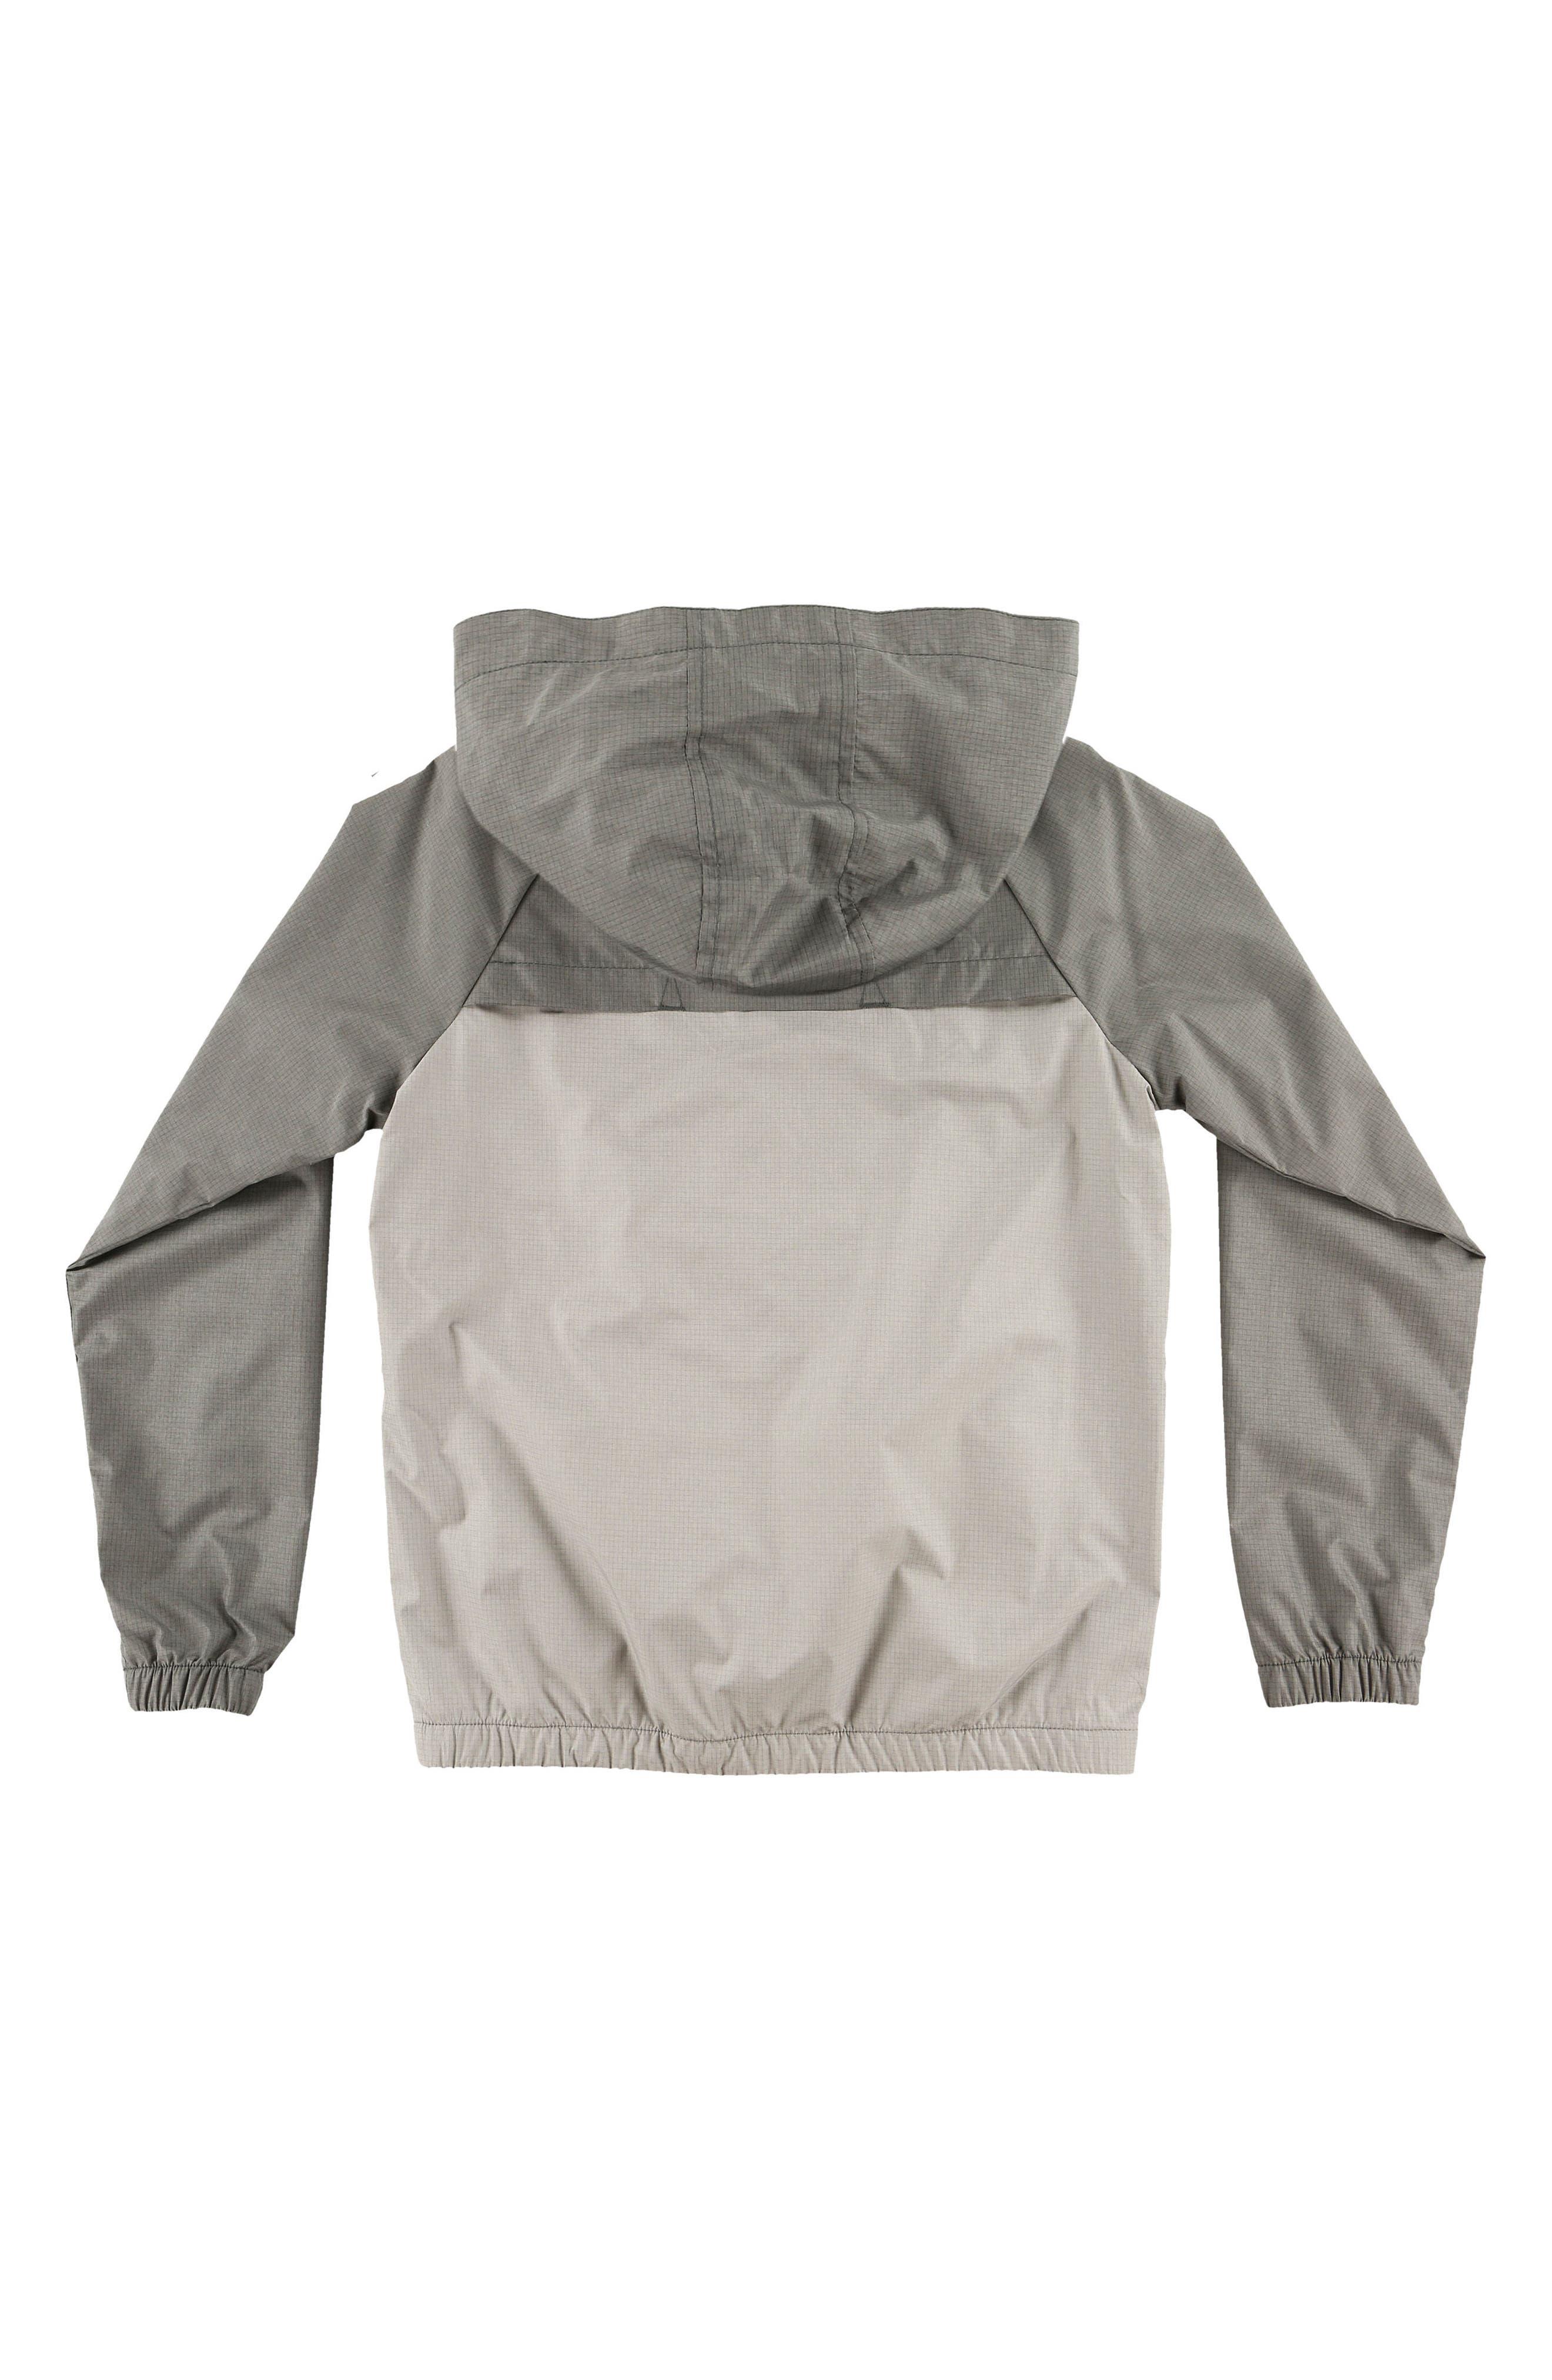 Traveler Packable Windbreaker Jacket,                             Main thumbnail 1, color,                             020